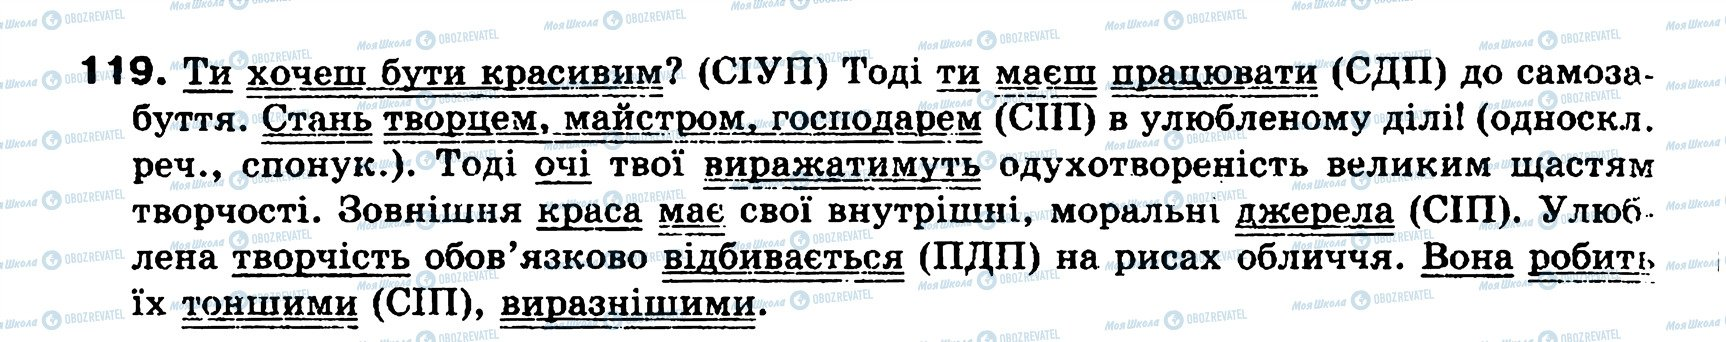 ГДЗ Укр мова 8 класс страница 119